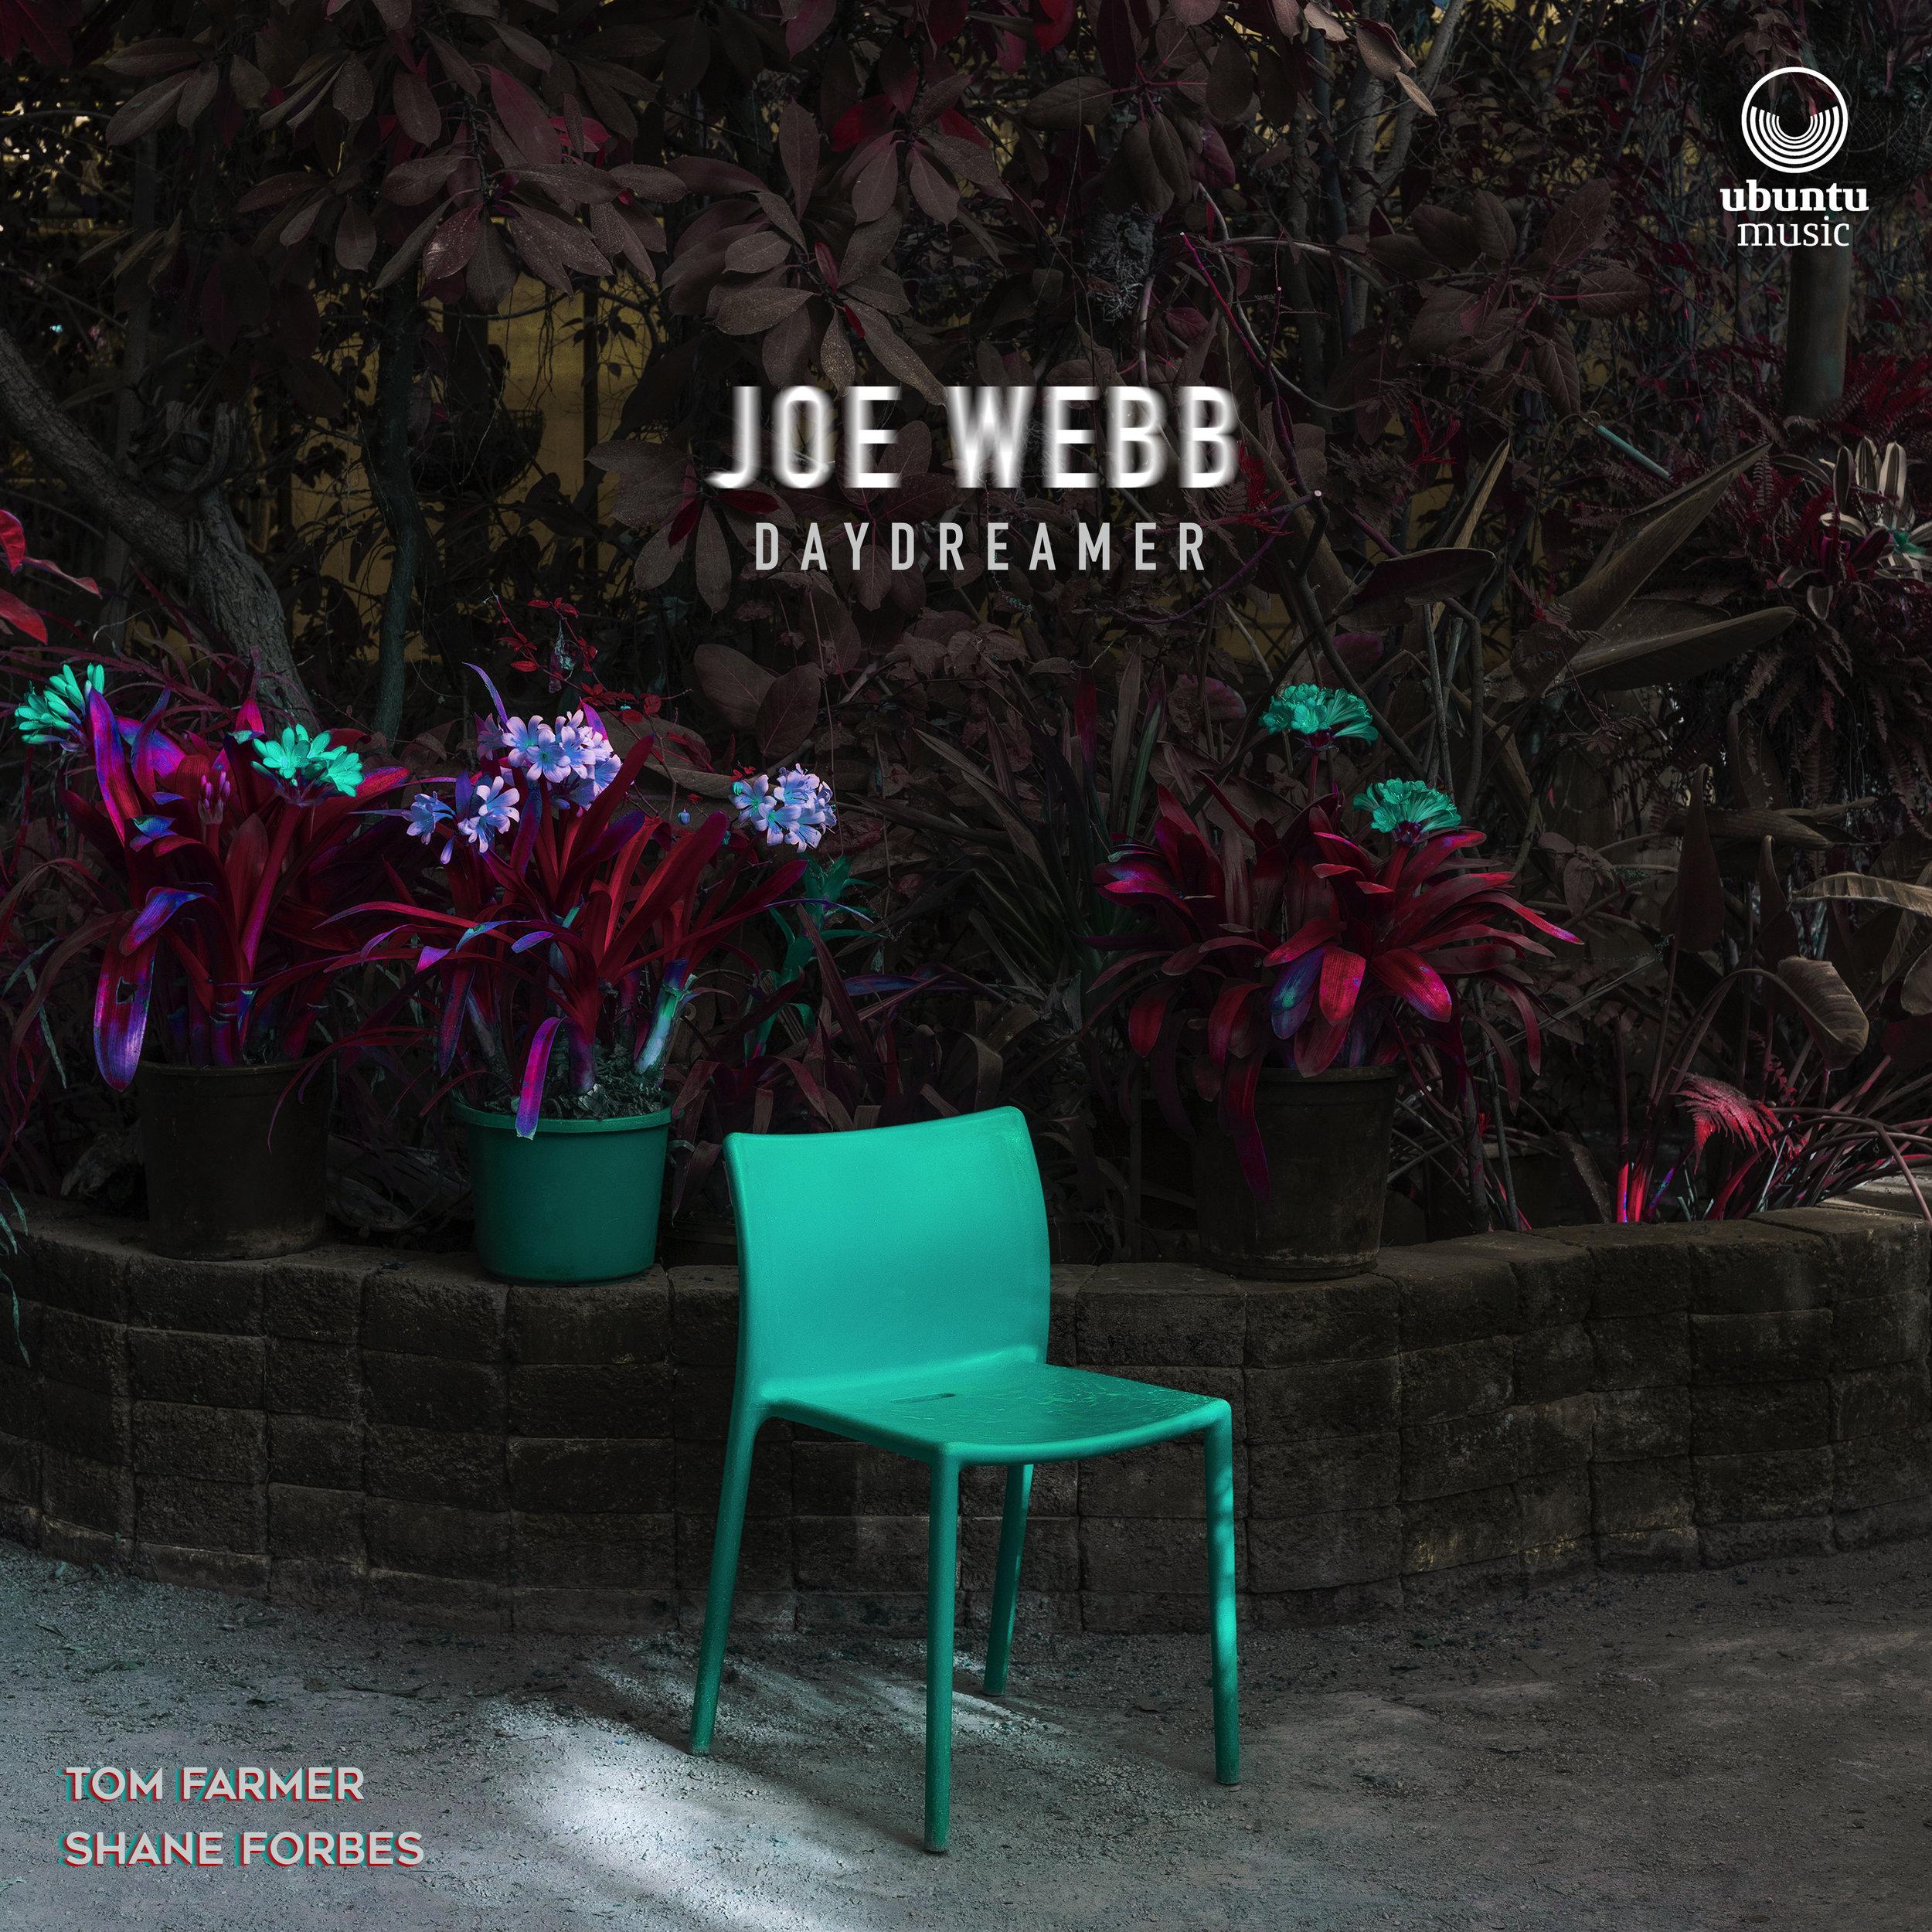 Joe Webb / Daydreamer